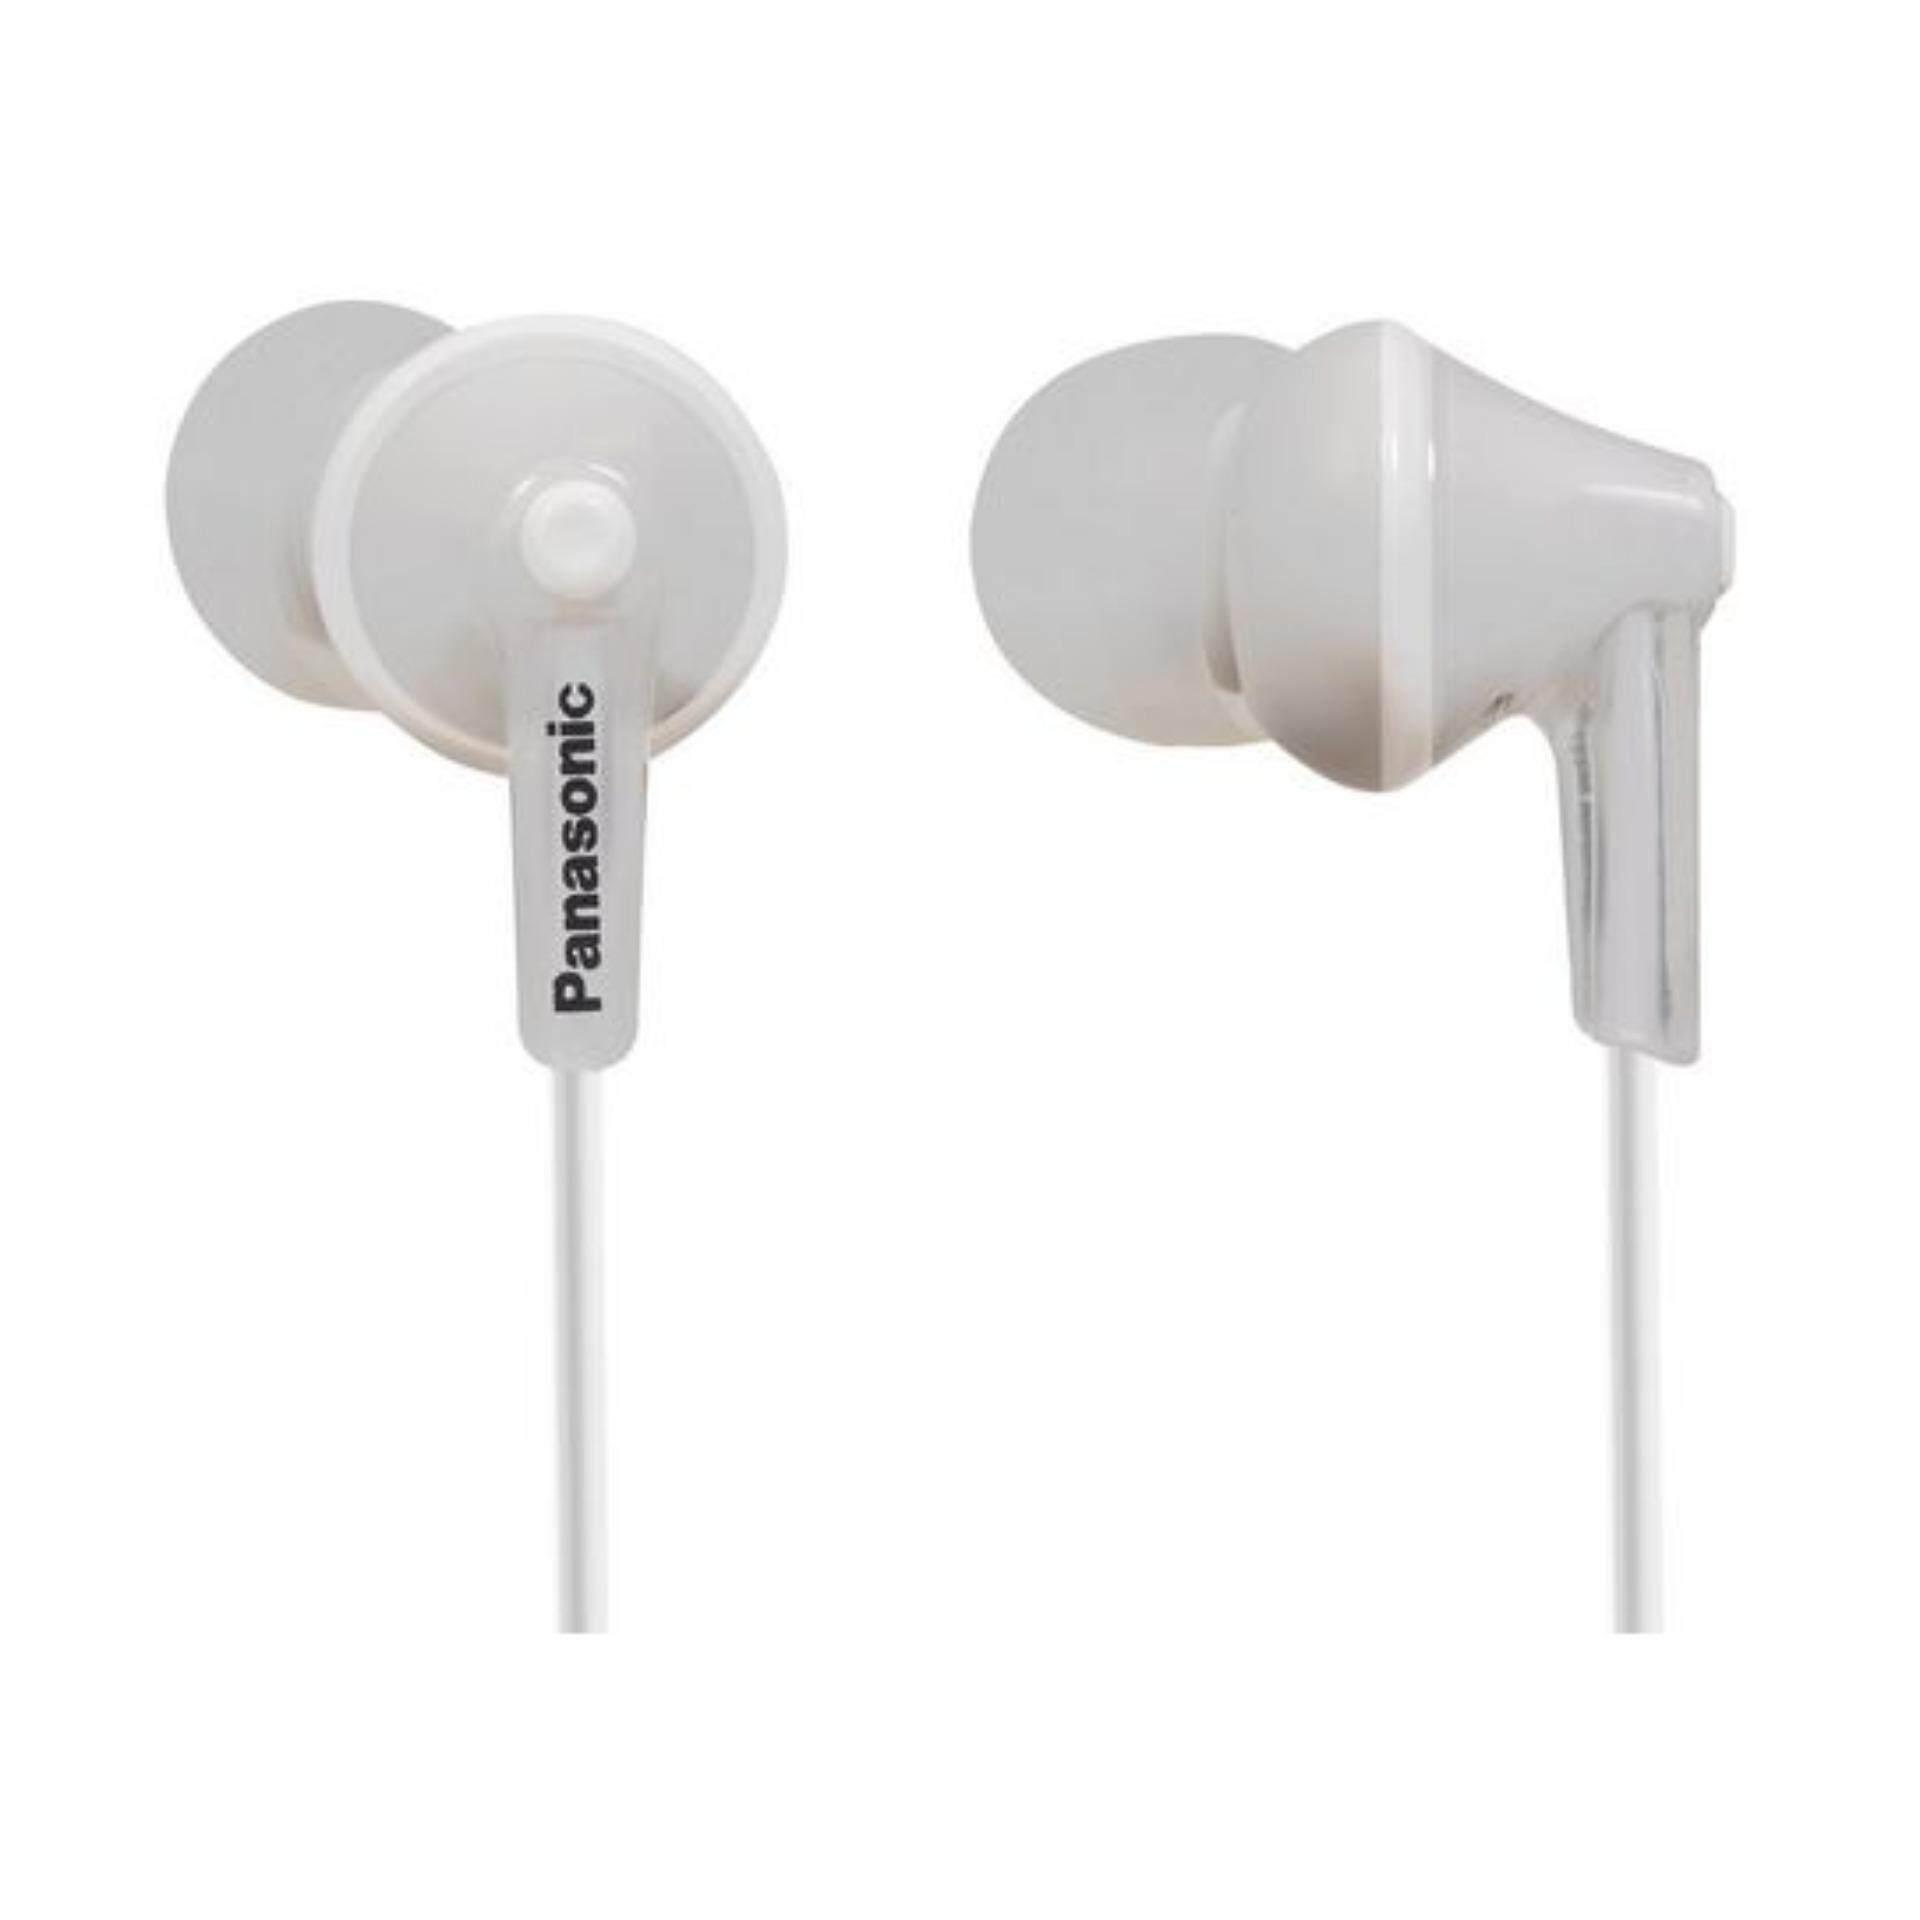 Panasonic RP-HJE125-W Stereo In Ear Canal Bud Ergofit Headphones RPHJE125 White -